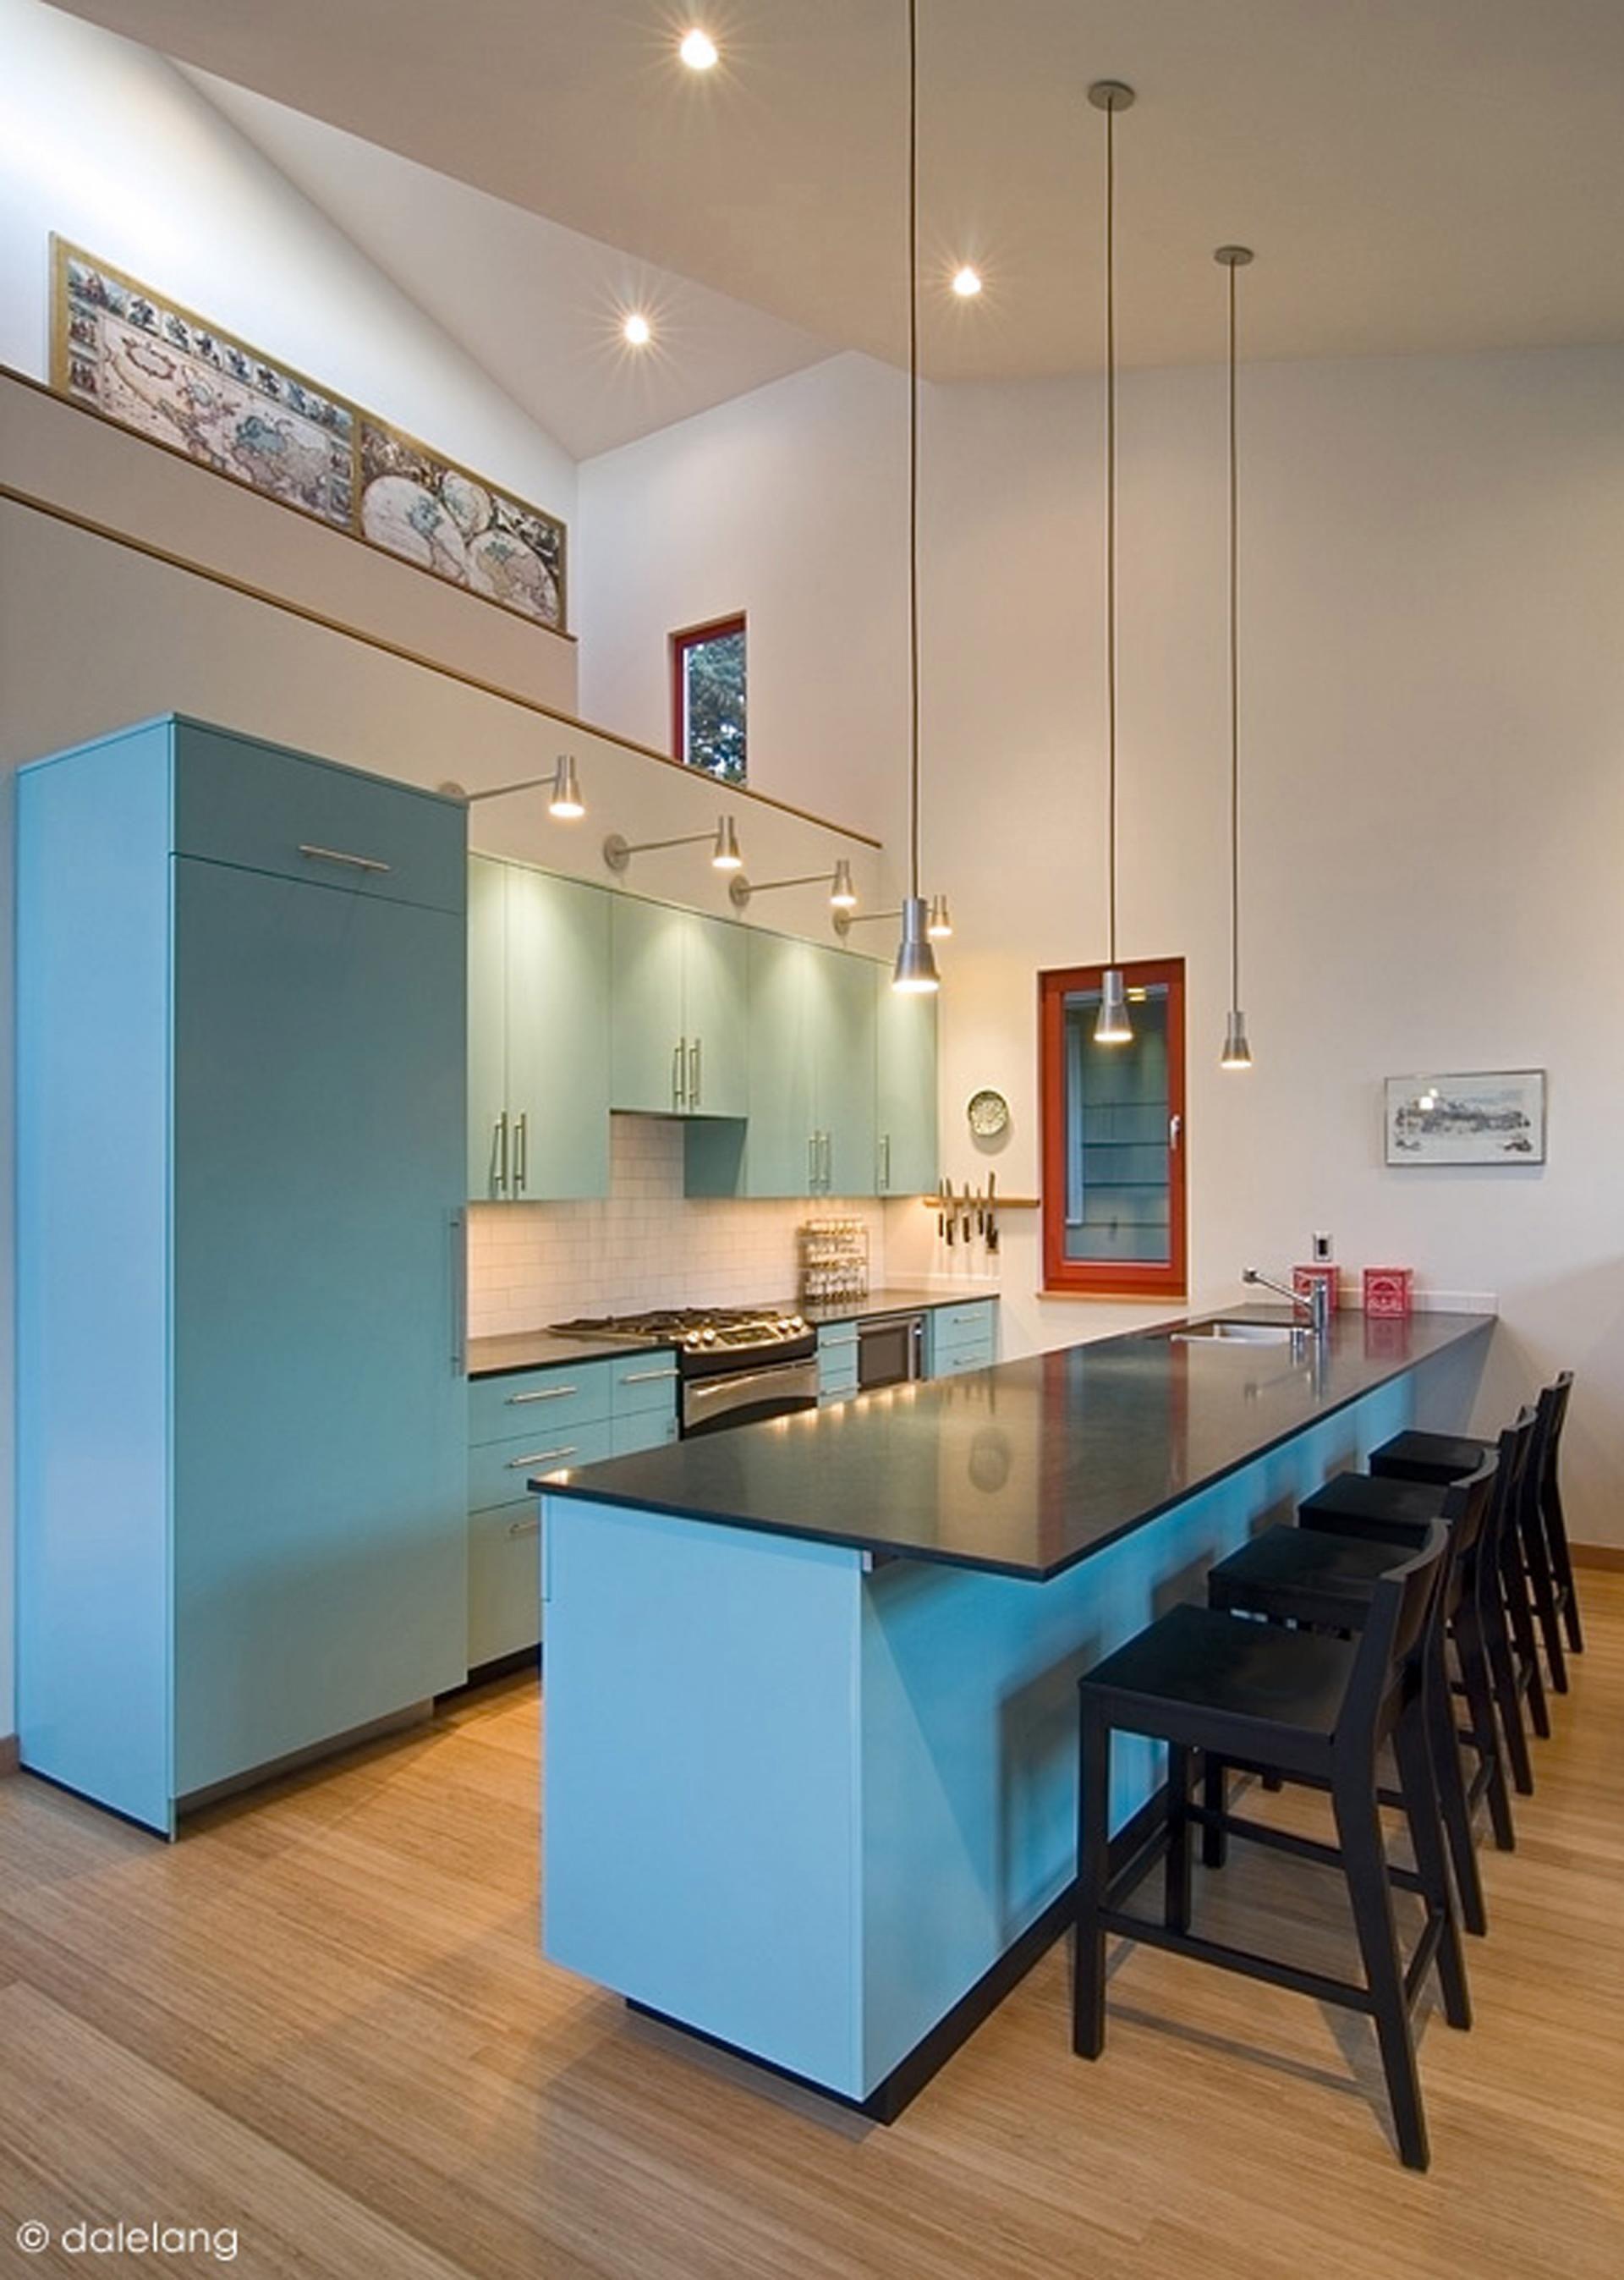 Burke Gilman House by Stettler Design and Paul Michael Davis Design by Stettler Design as Architects